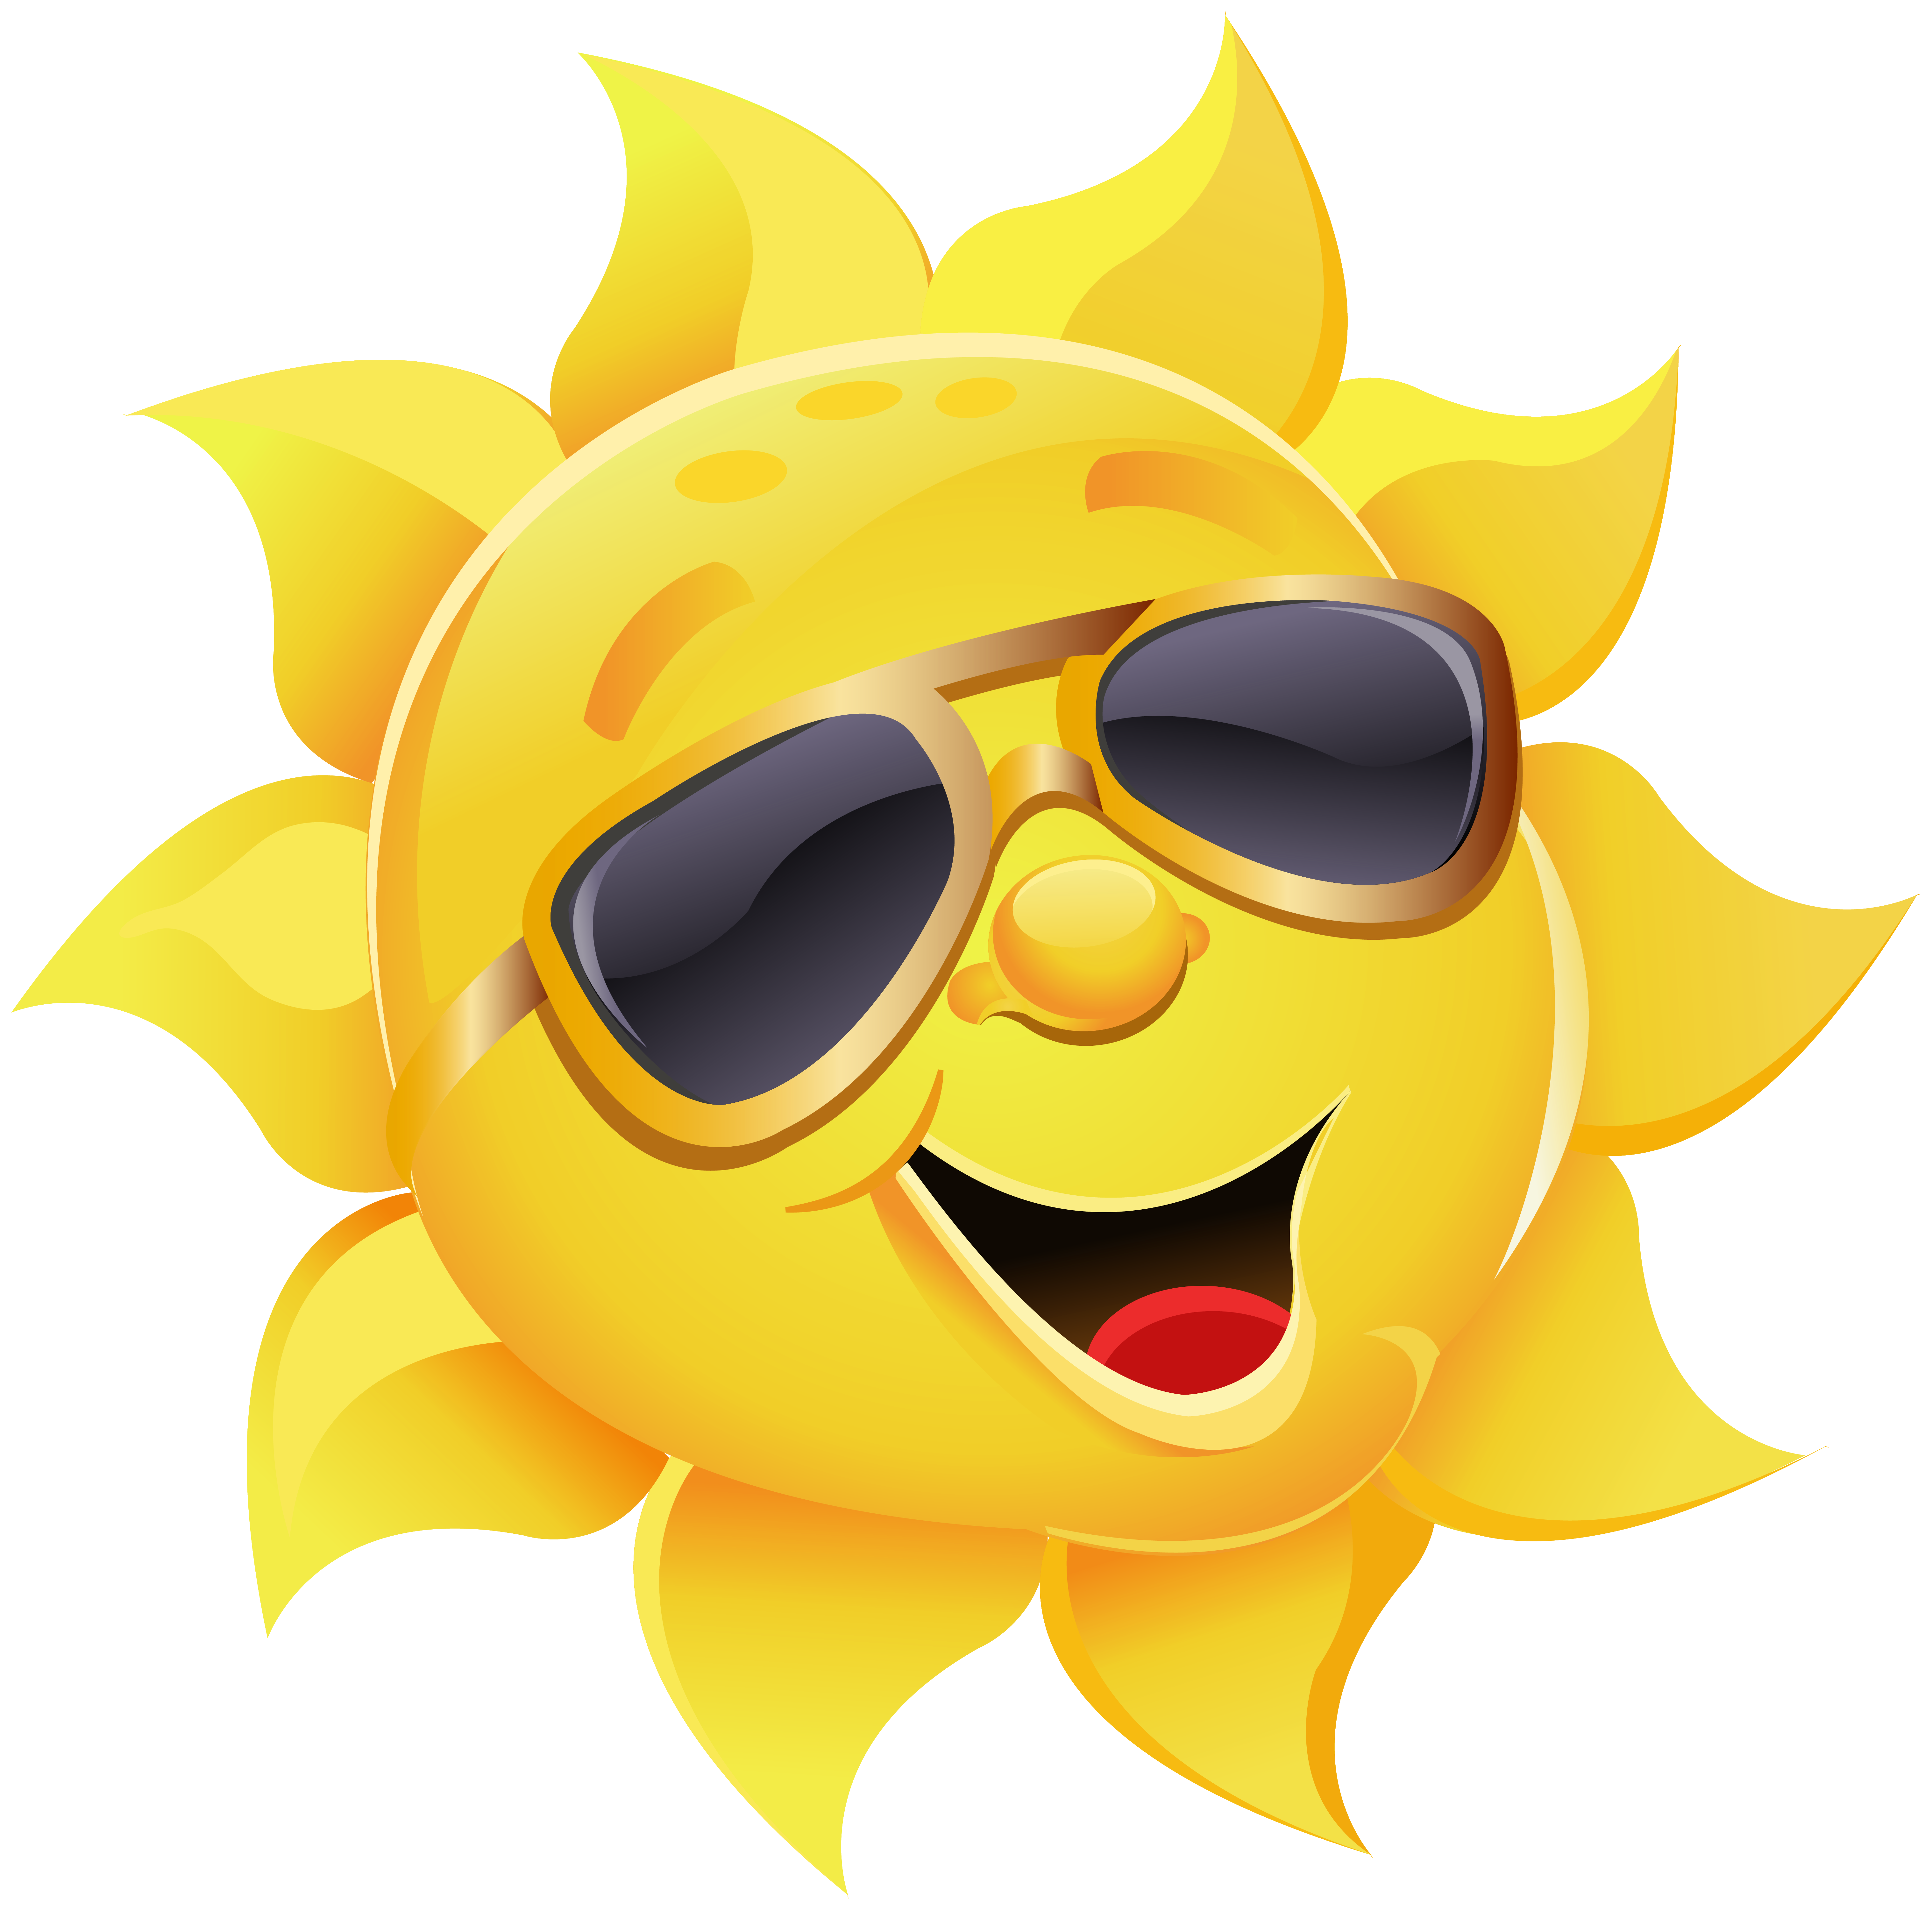 Sun with glasses clipart clipart library download Aviator sunglasses Stock illustration Clip art - Sun with Sunglasses ... clipart library download